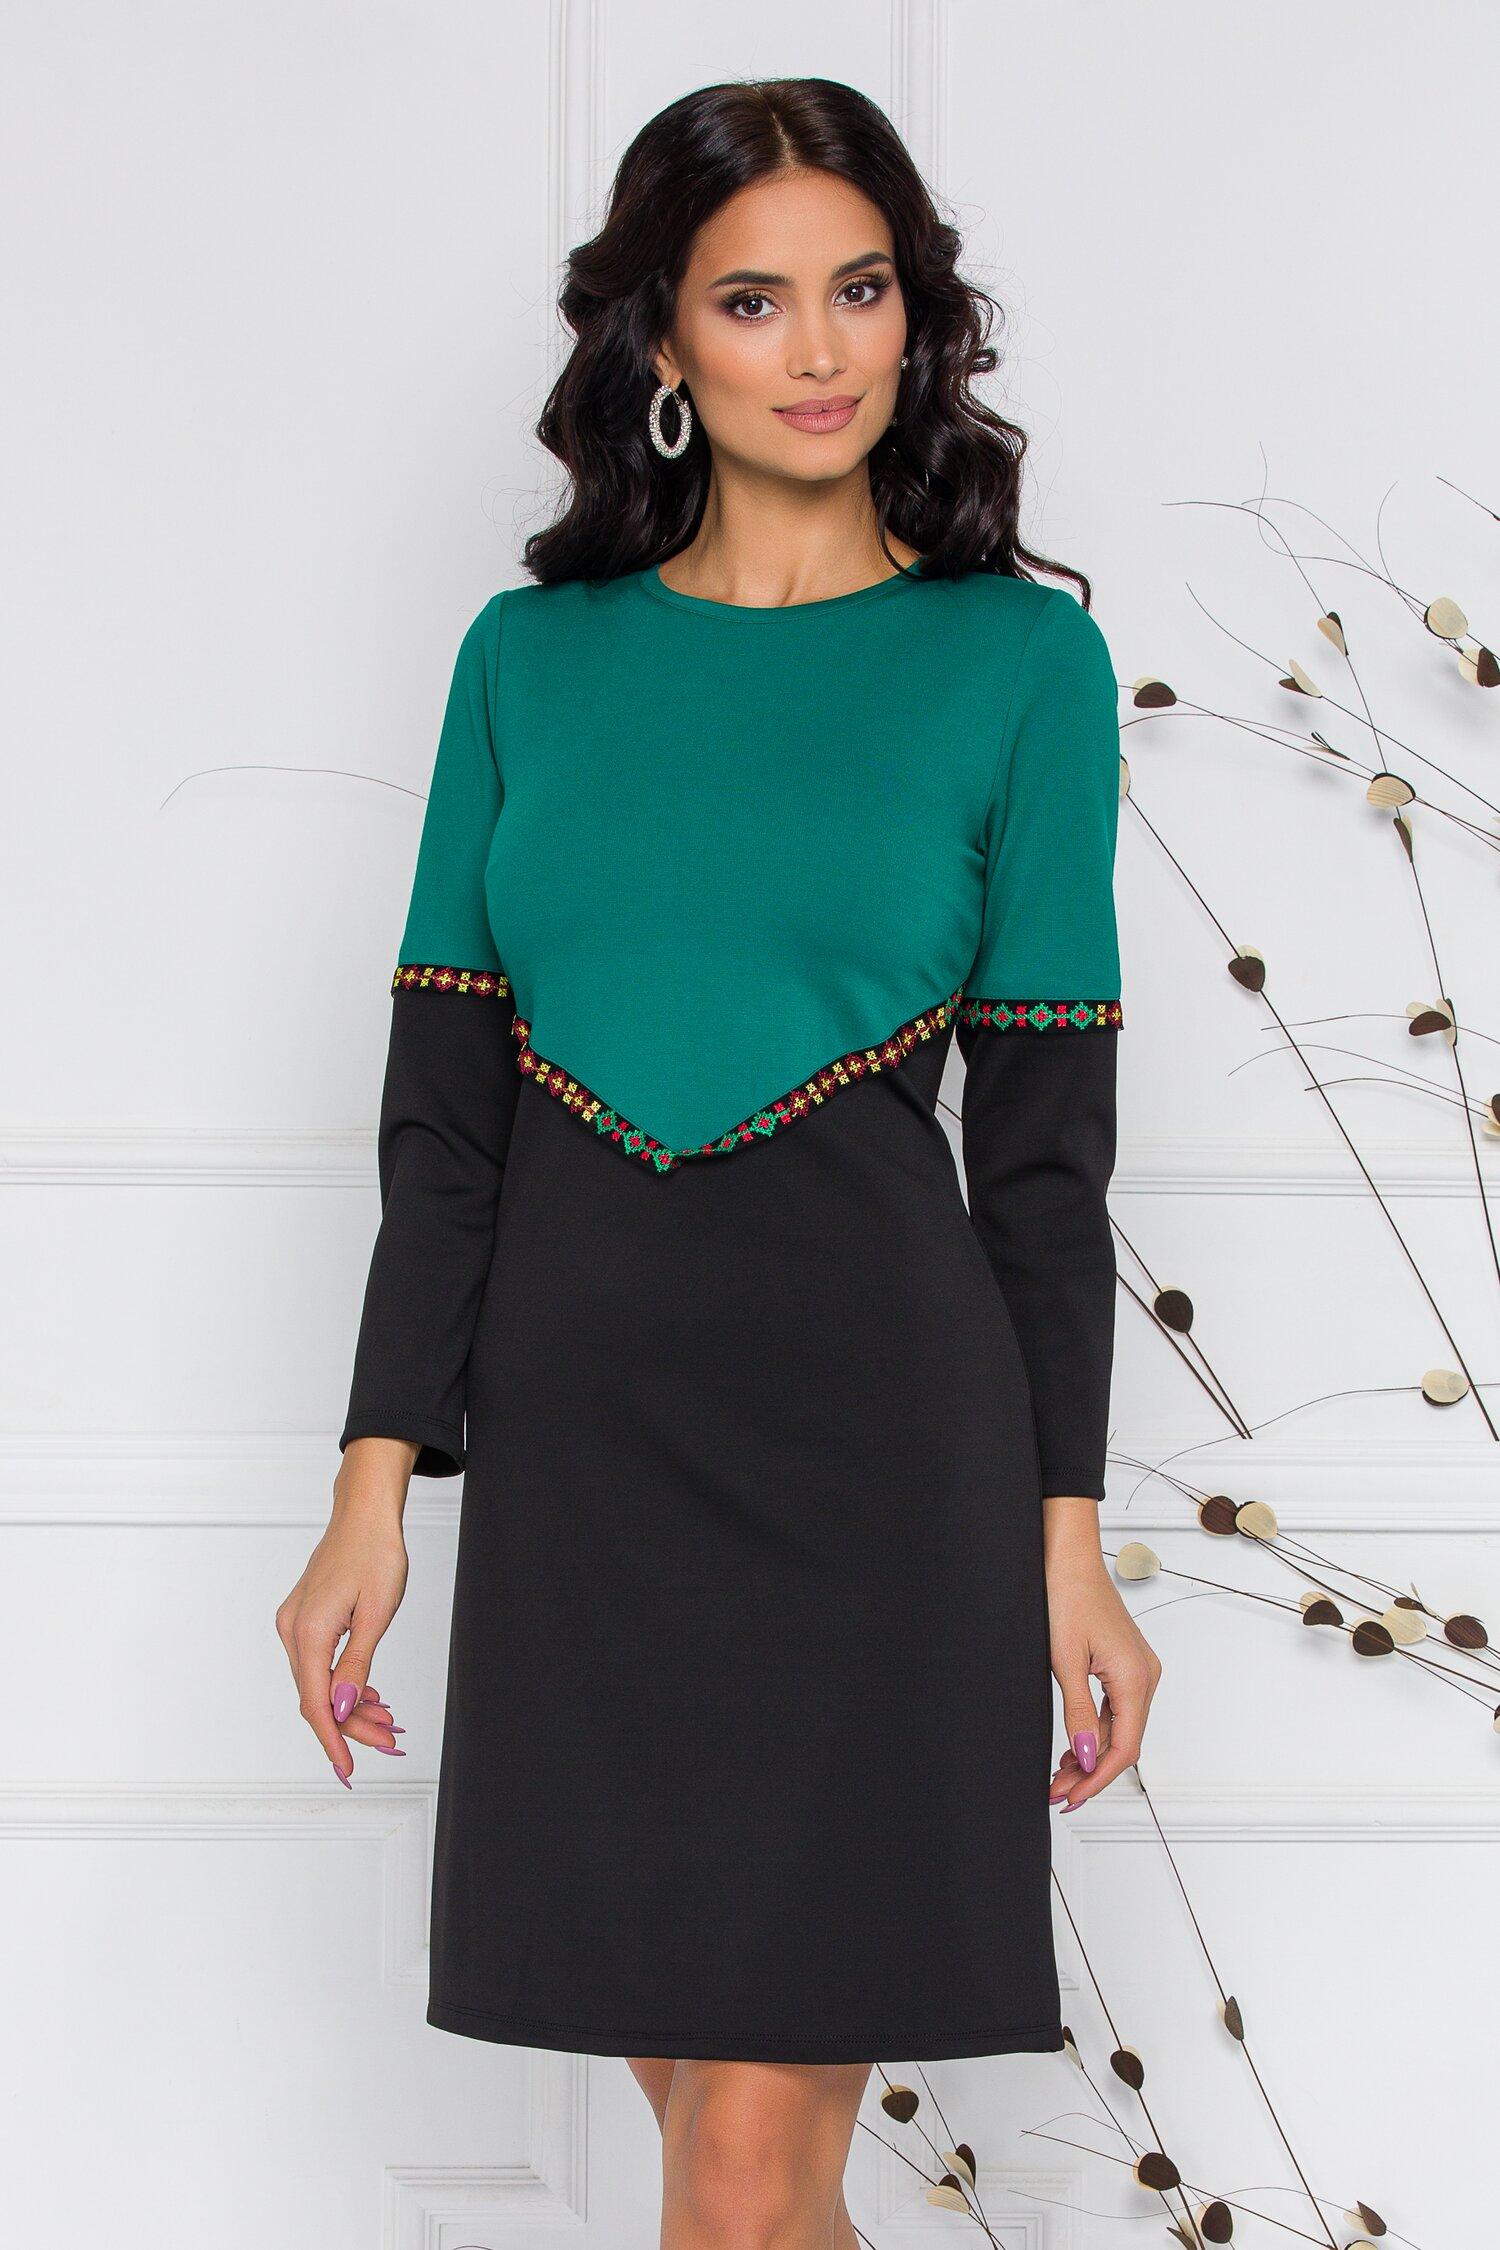 Rochie Ella Collection Gabriela neagra cu verde si broderie traditionala